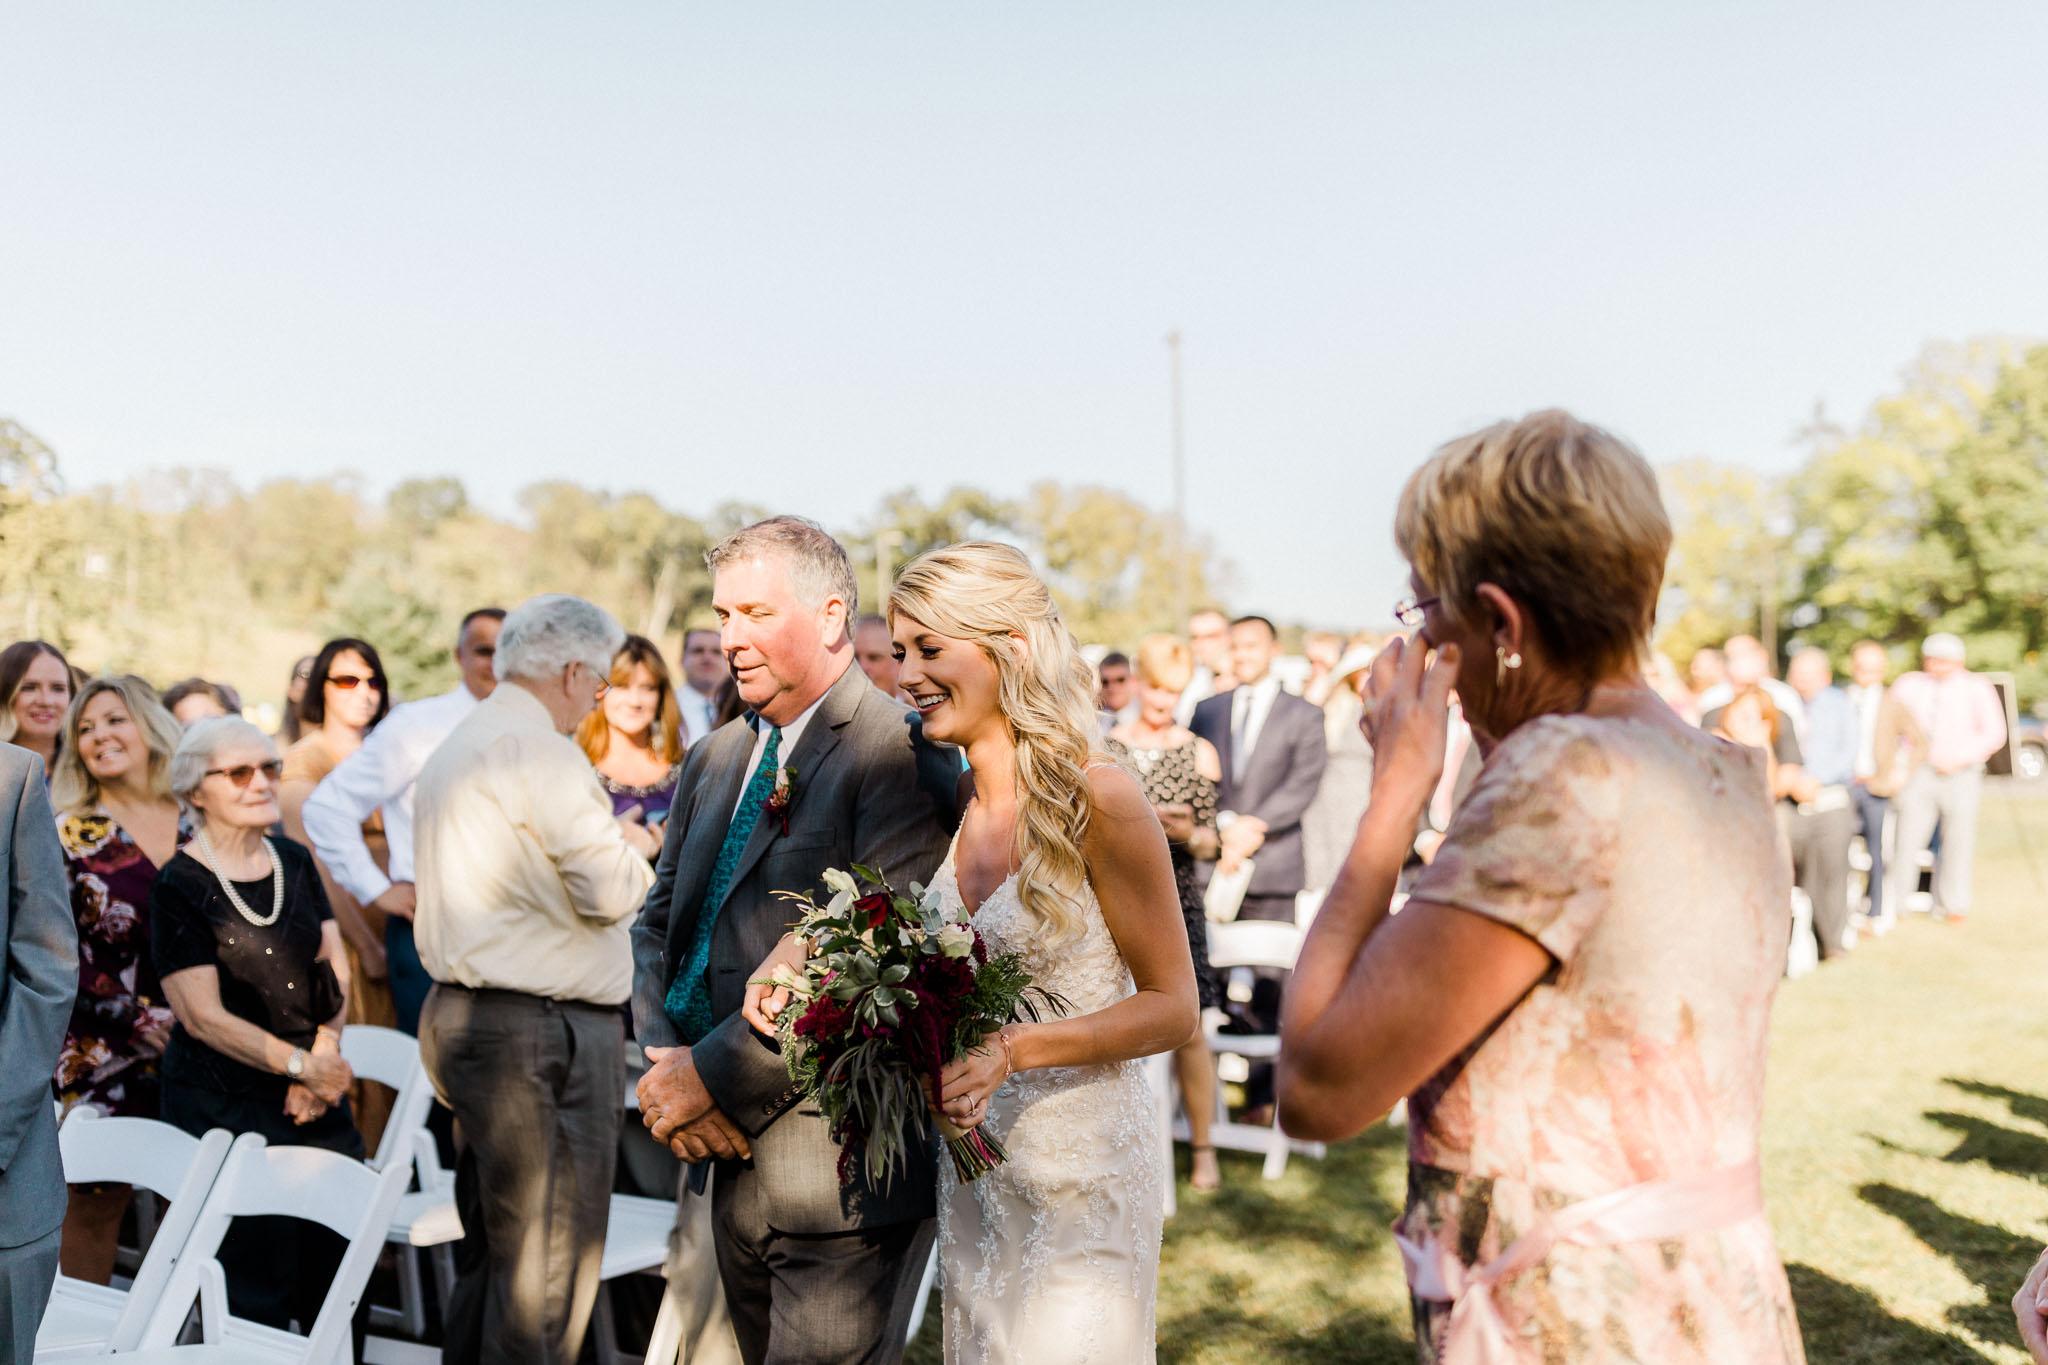 Frosty-Valley-September-Wedding-7748.jpg